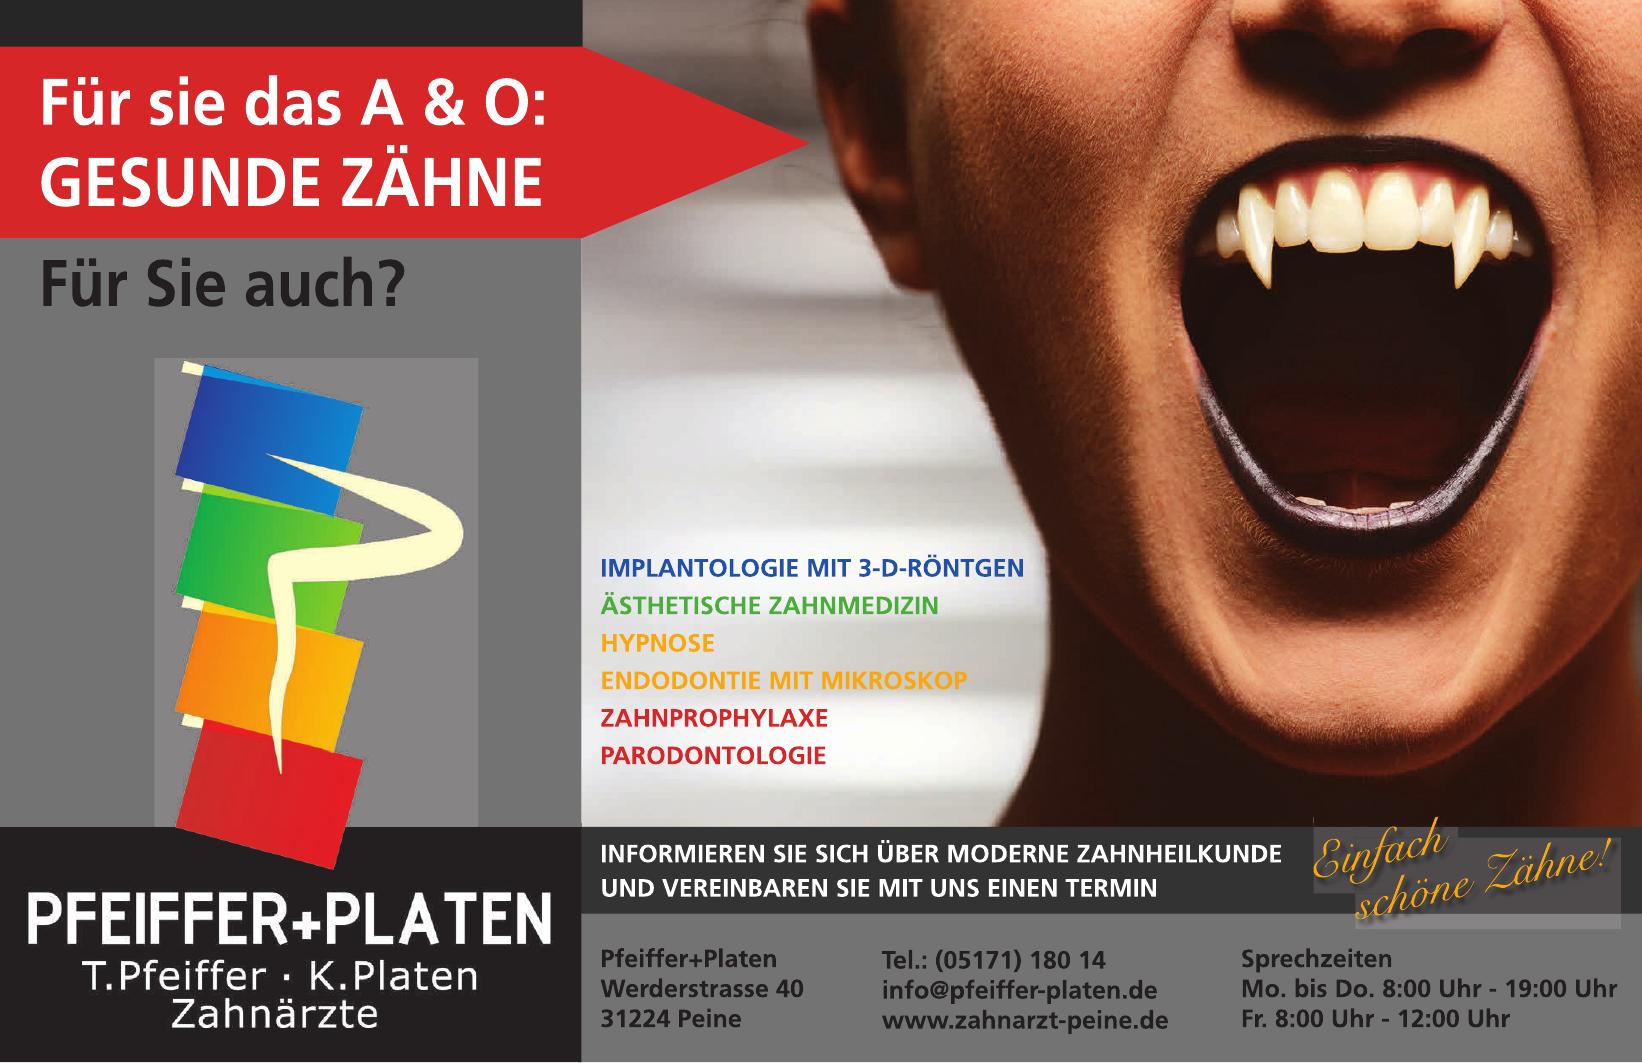 Pfeiffer + Platen Zahnärzte